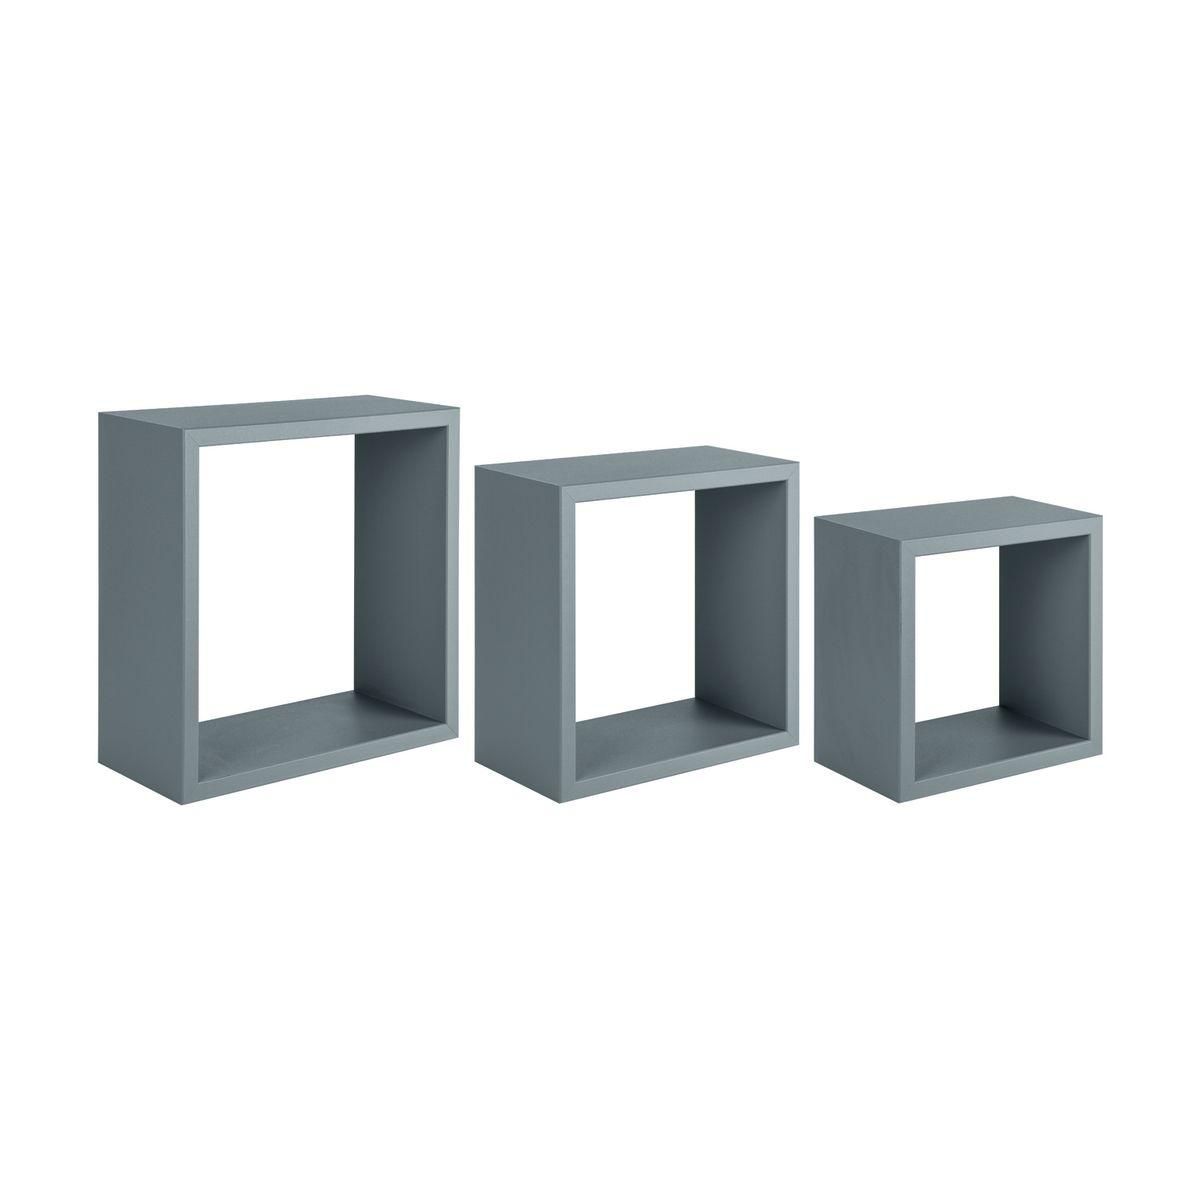 Porte in vetro leroy merlin speciale bagno serie neo with for Scale per interni leroy merlin